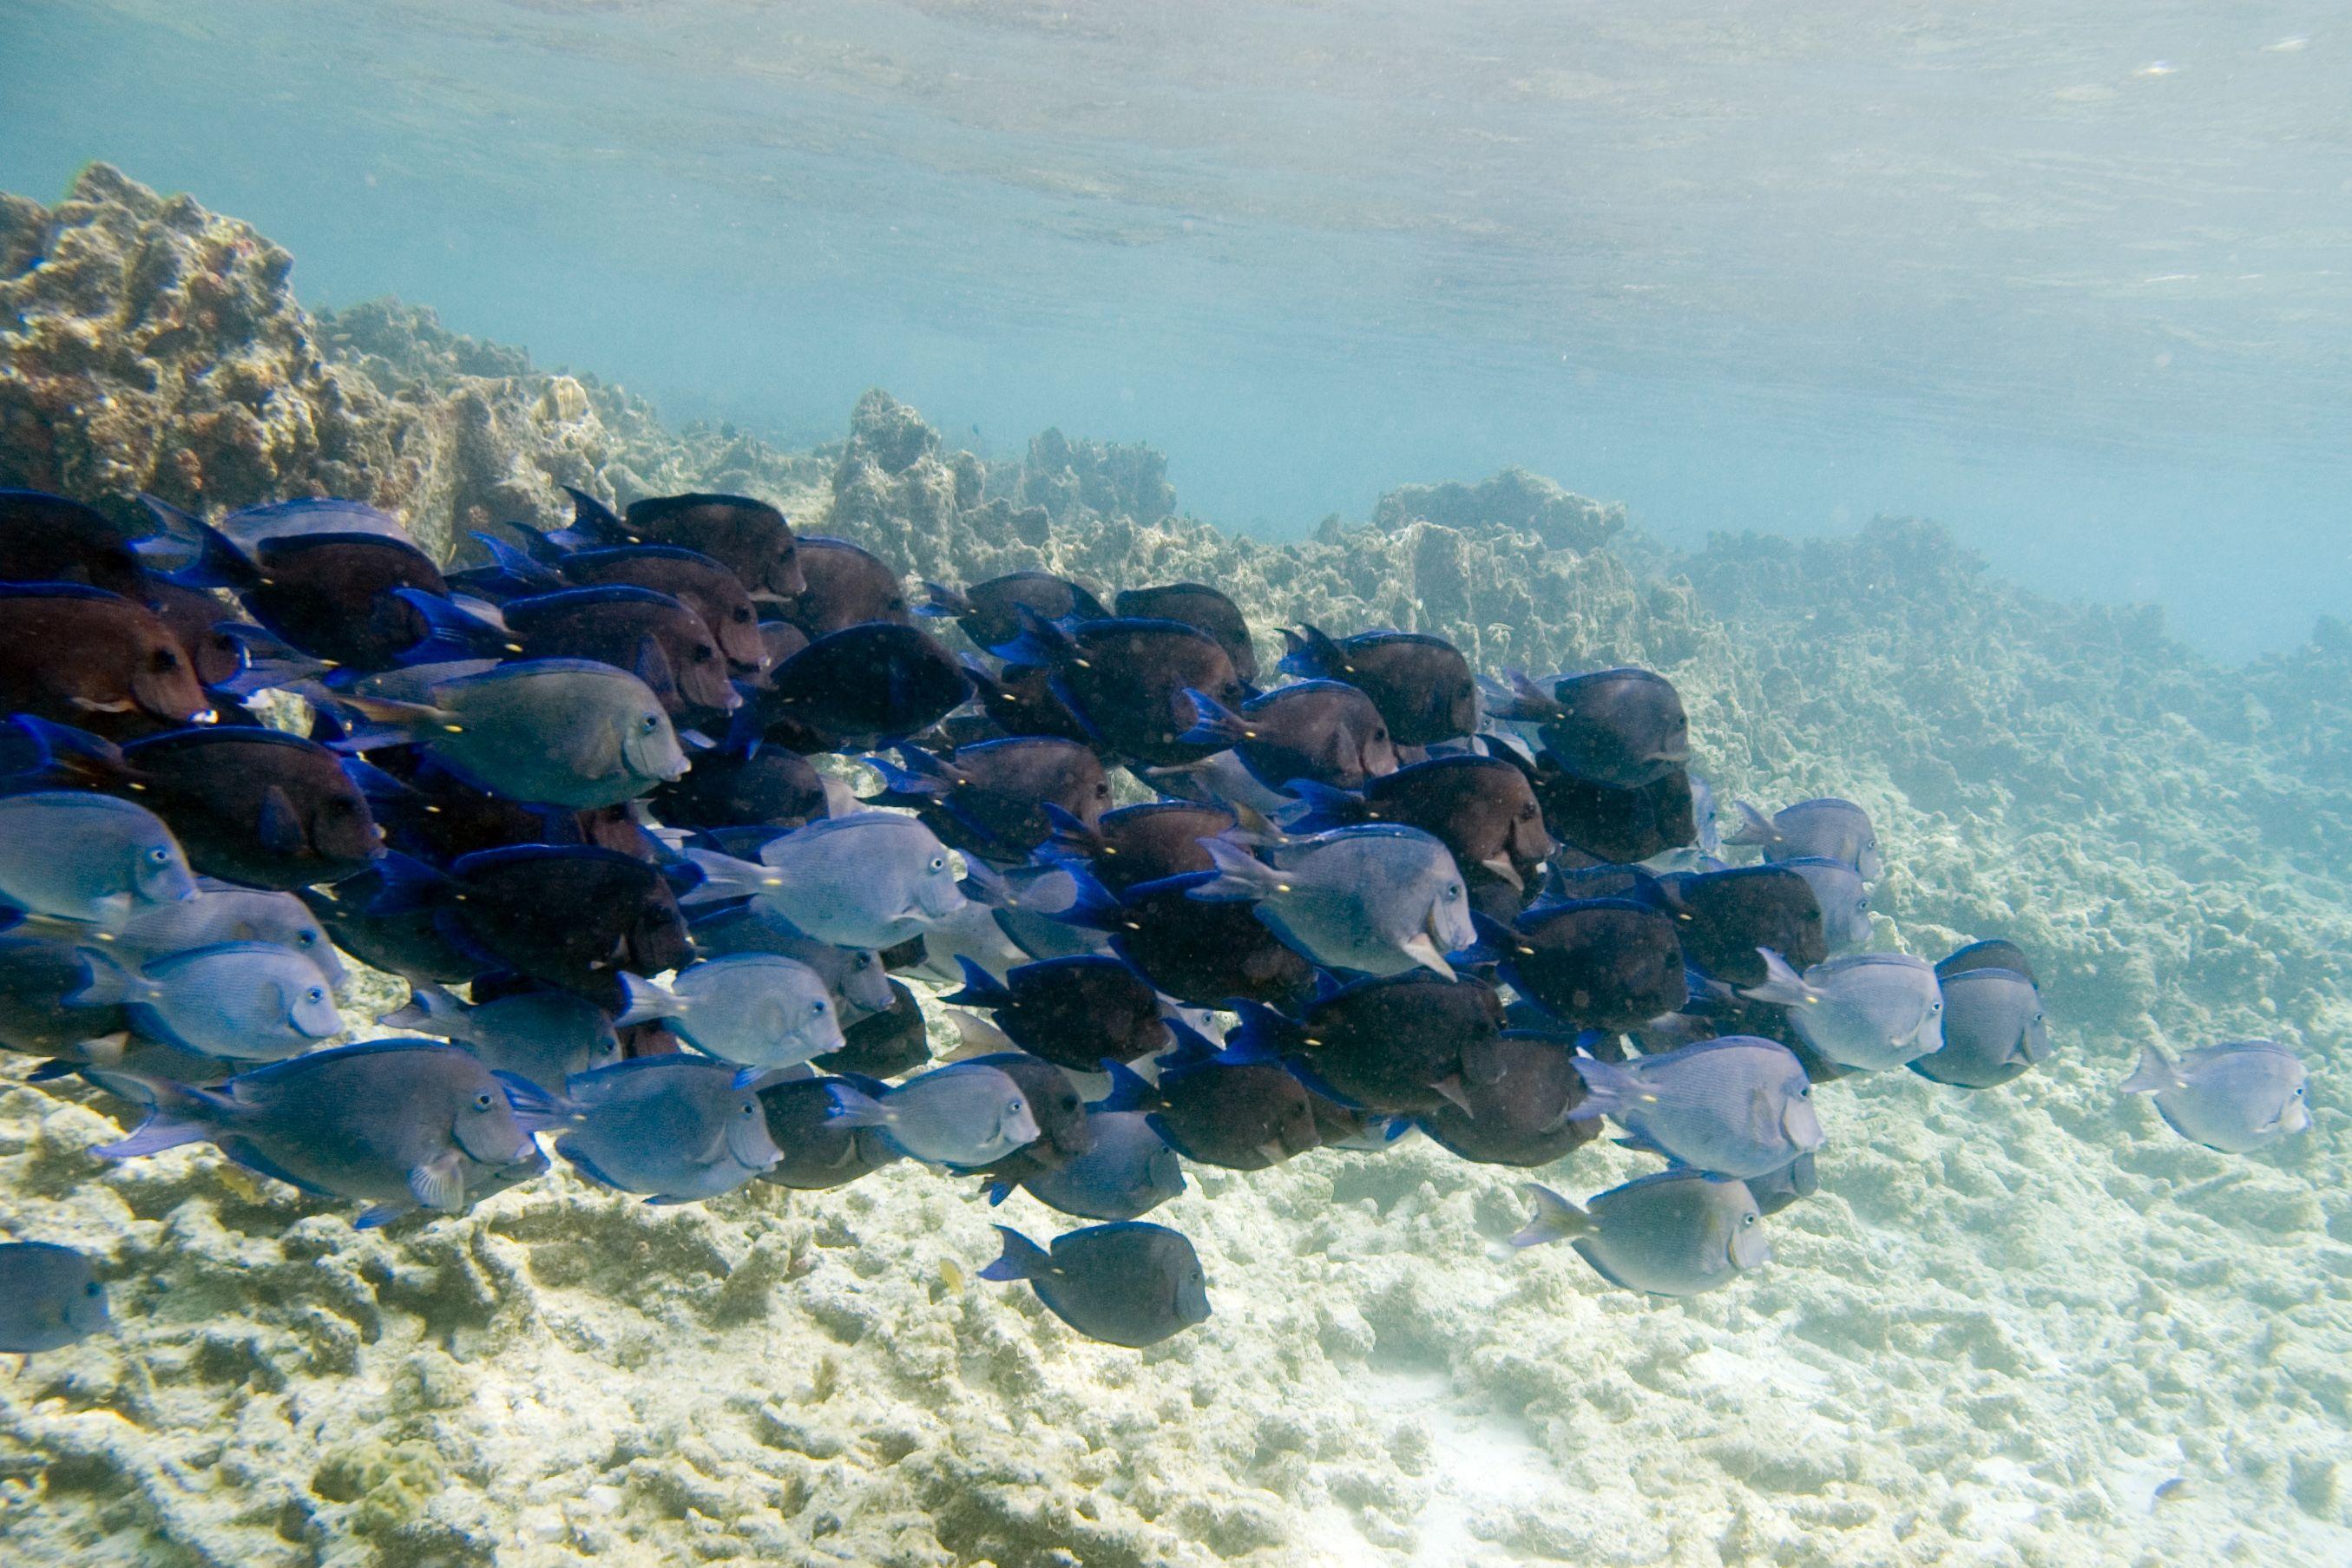 Acanthurus Coeruleus Caribbean Or Atlantic Blue Tang Caribbean Blue Tang Blue